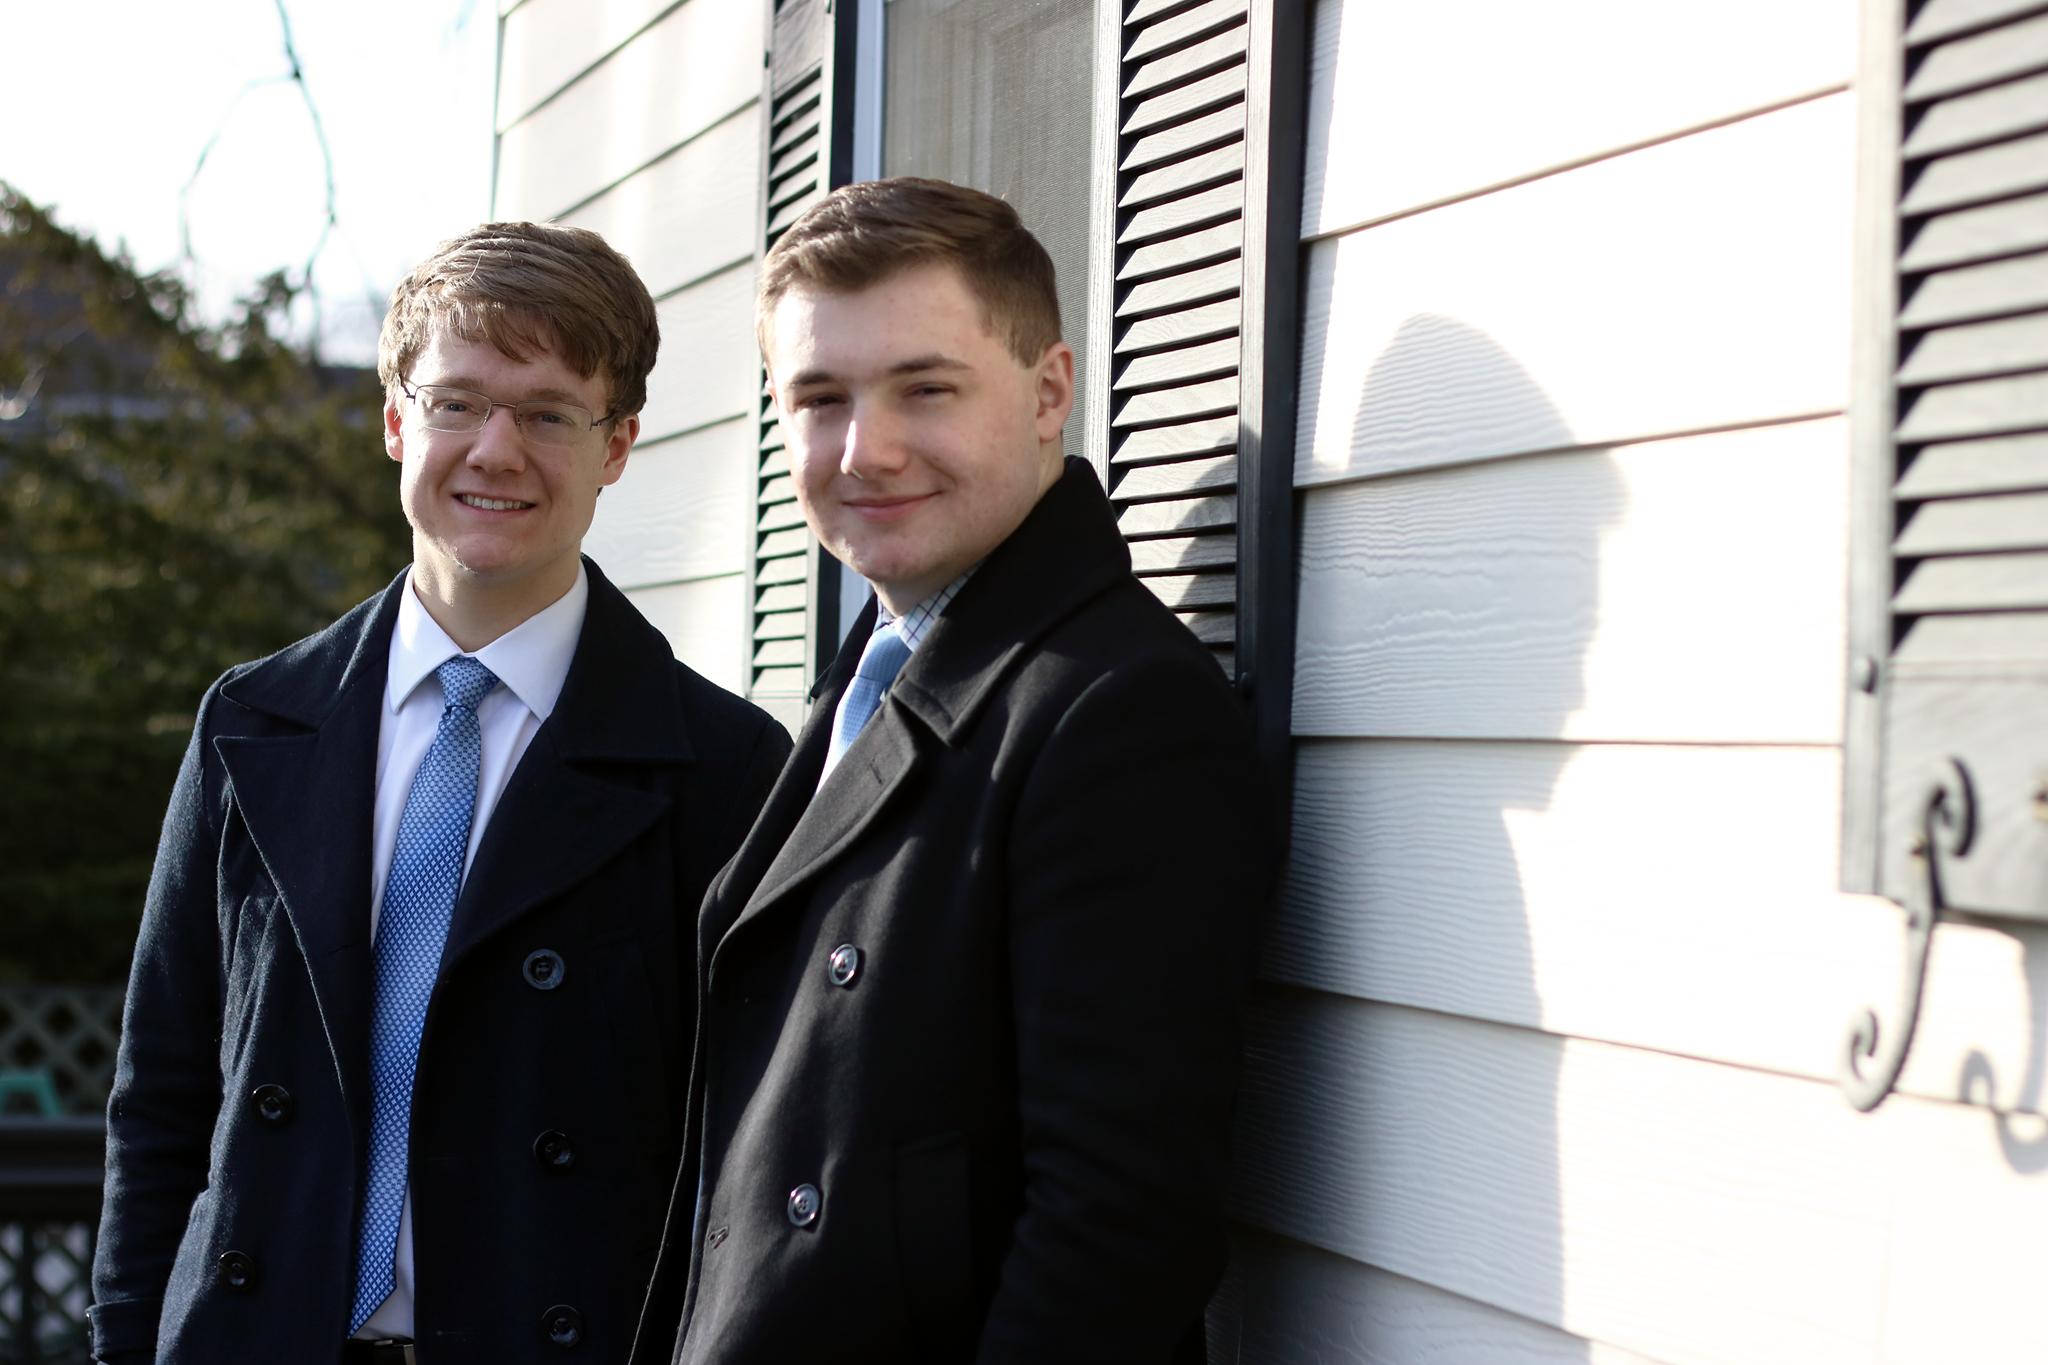 Patrick Henry College (PHC) student body Vice President-Elect Matthew Hoke and President-Elect Daniel Thetford